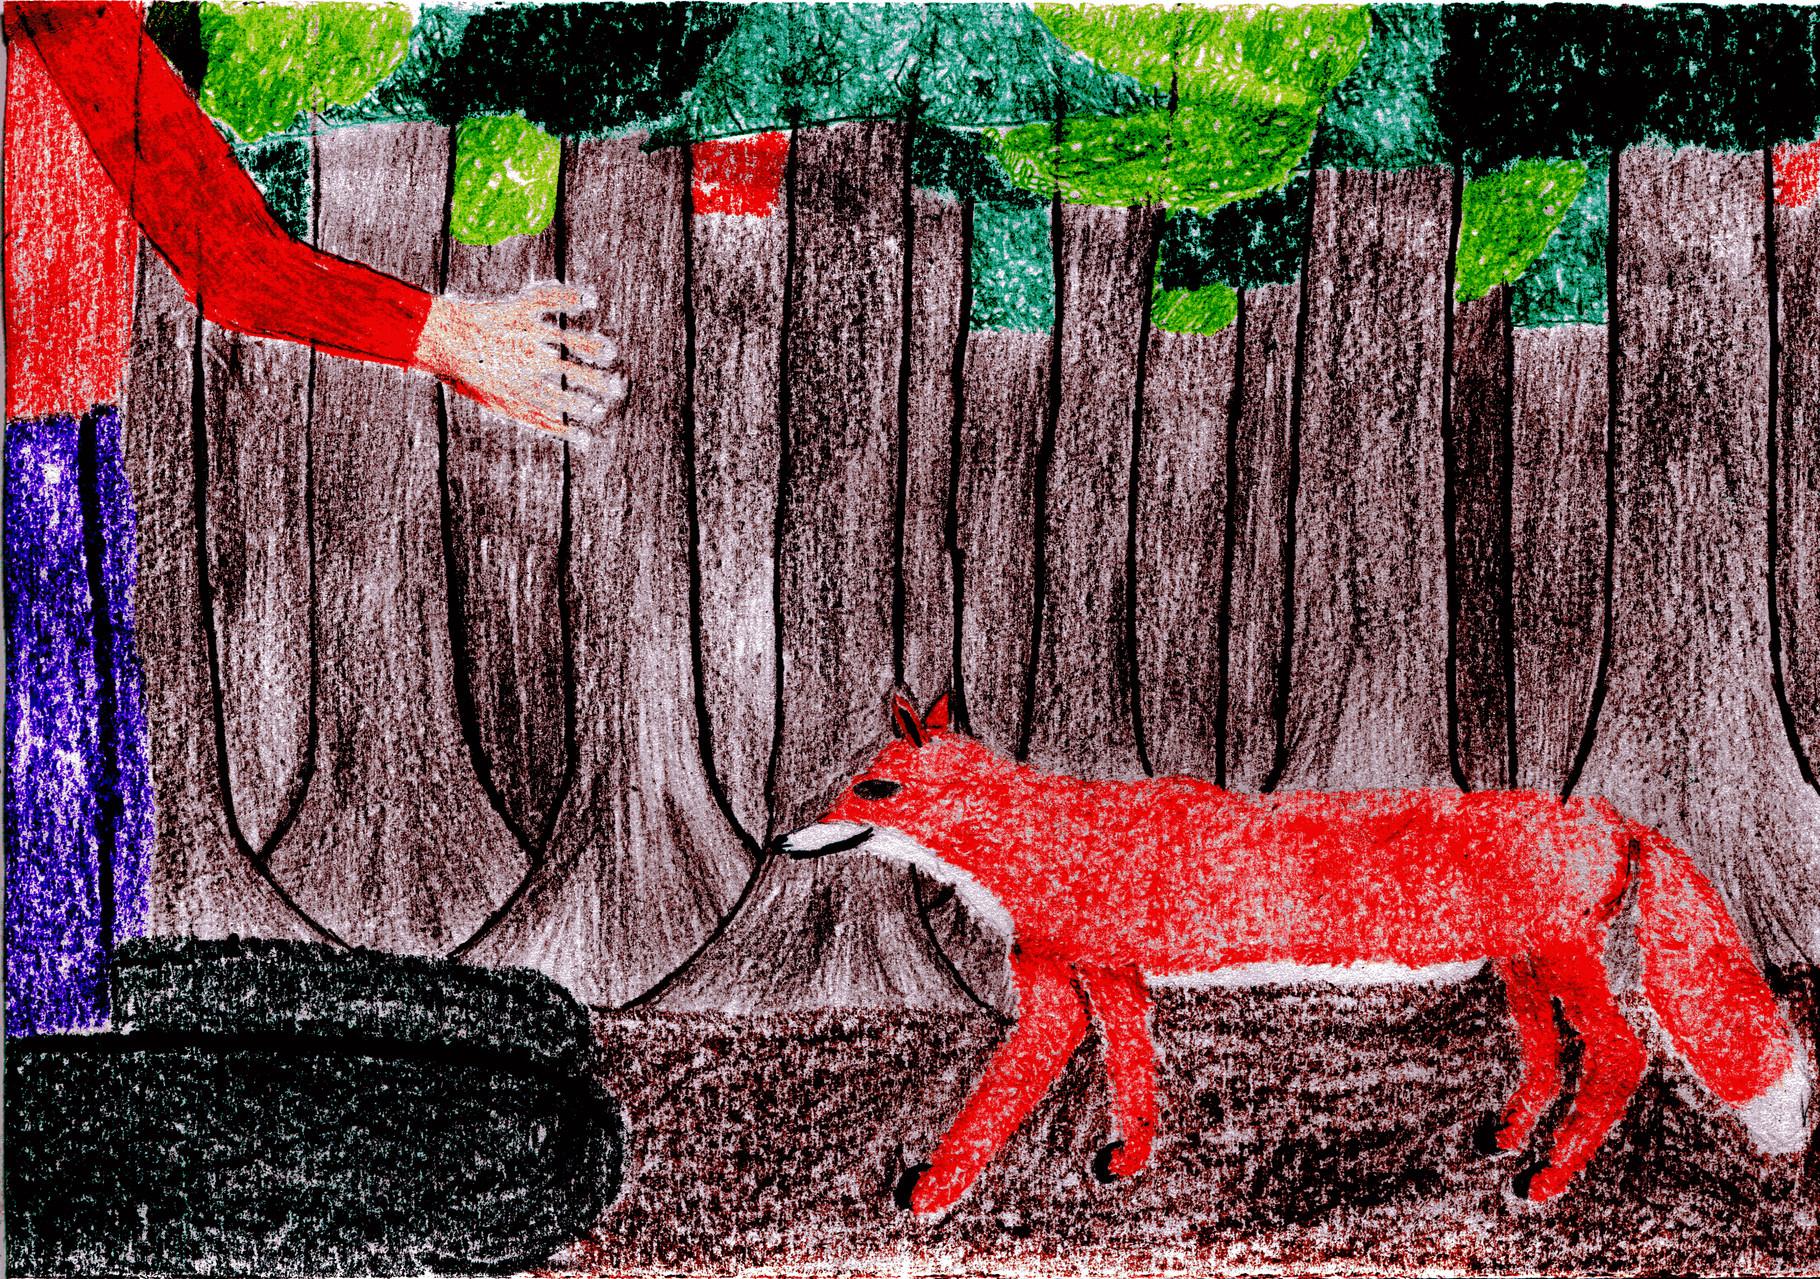 Dorothea trifft den Fuchs